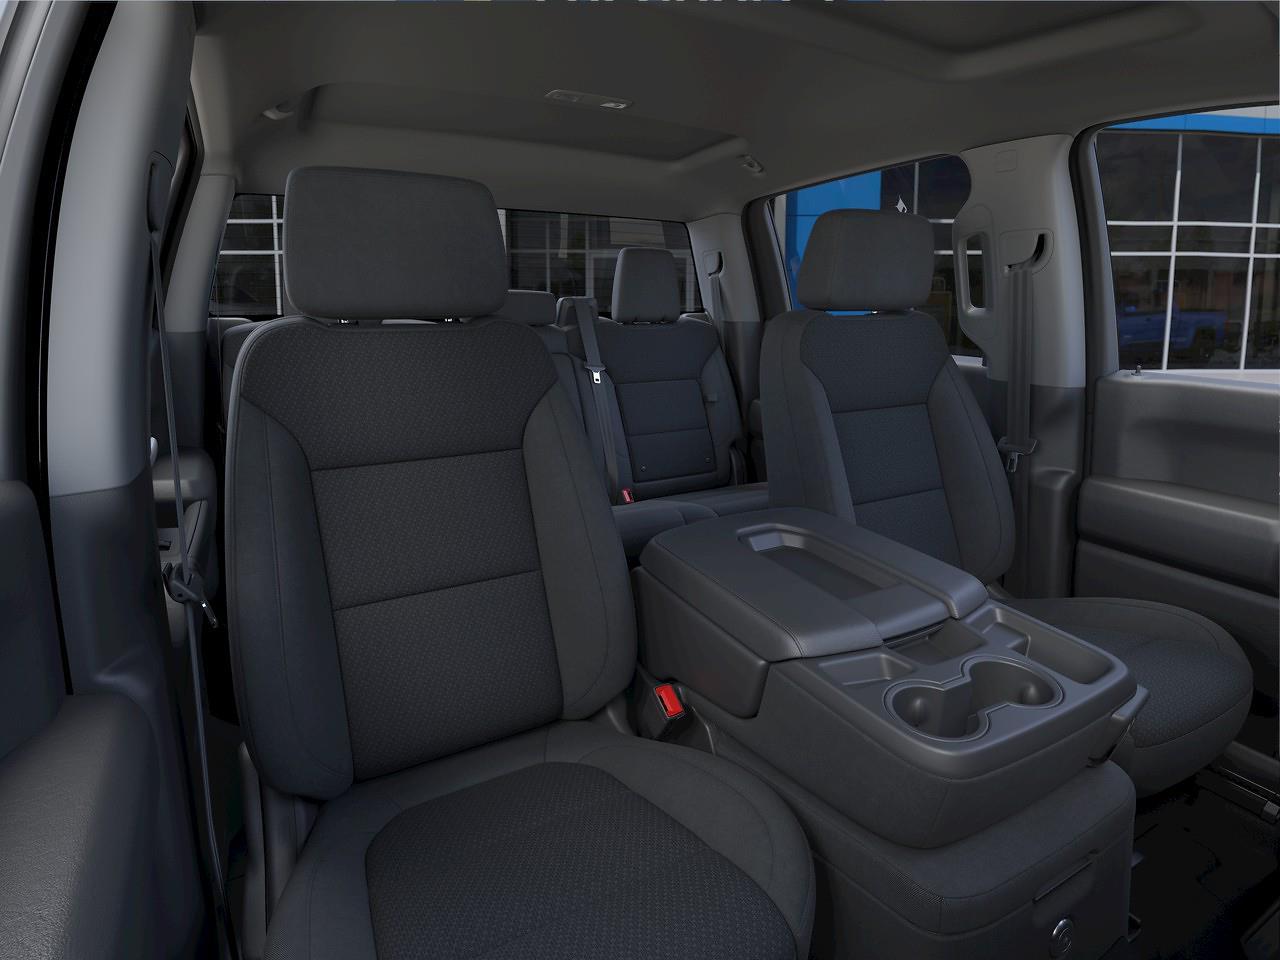 2021 Chevrolet Silverado 1500 Crew Cab 4x4, Pickup #Q210467 - photo 13